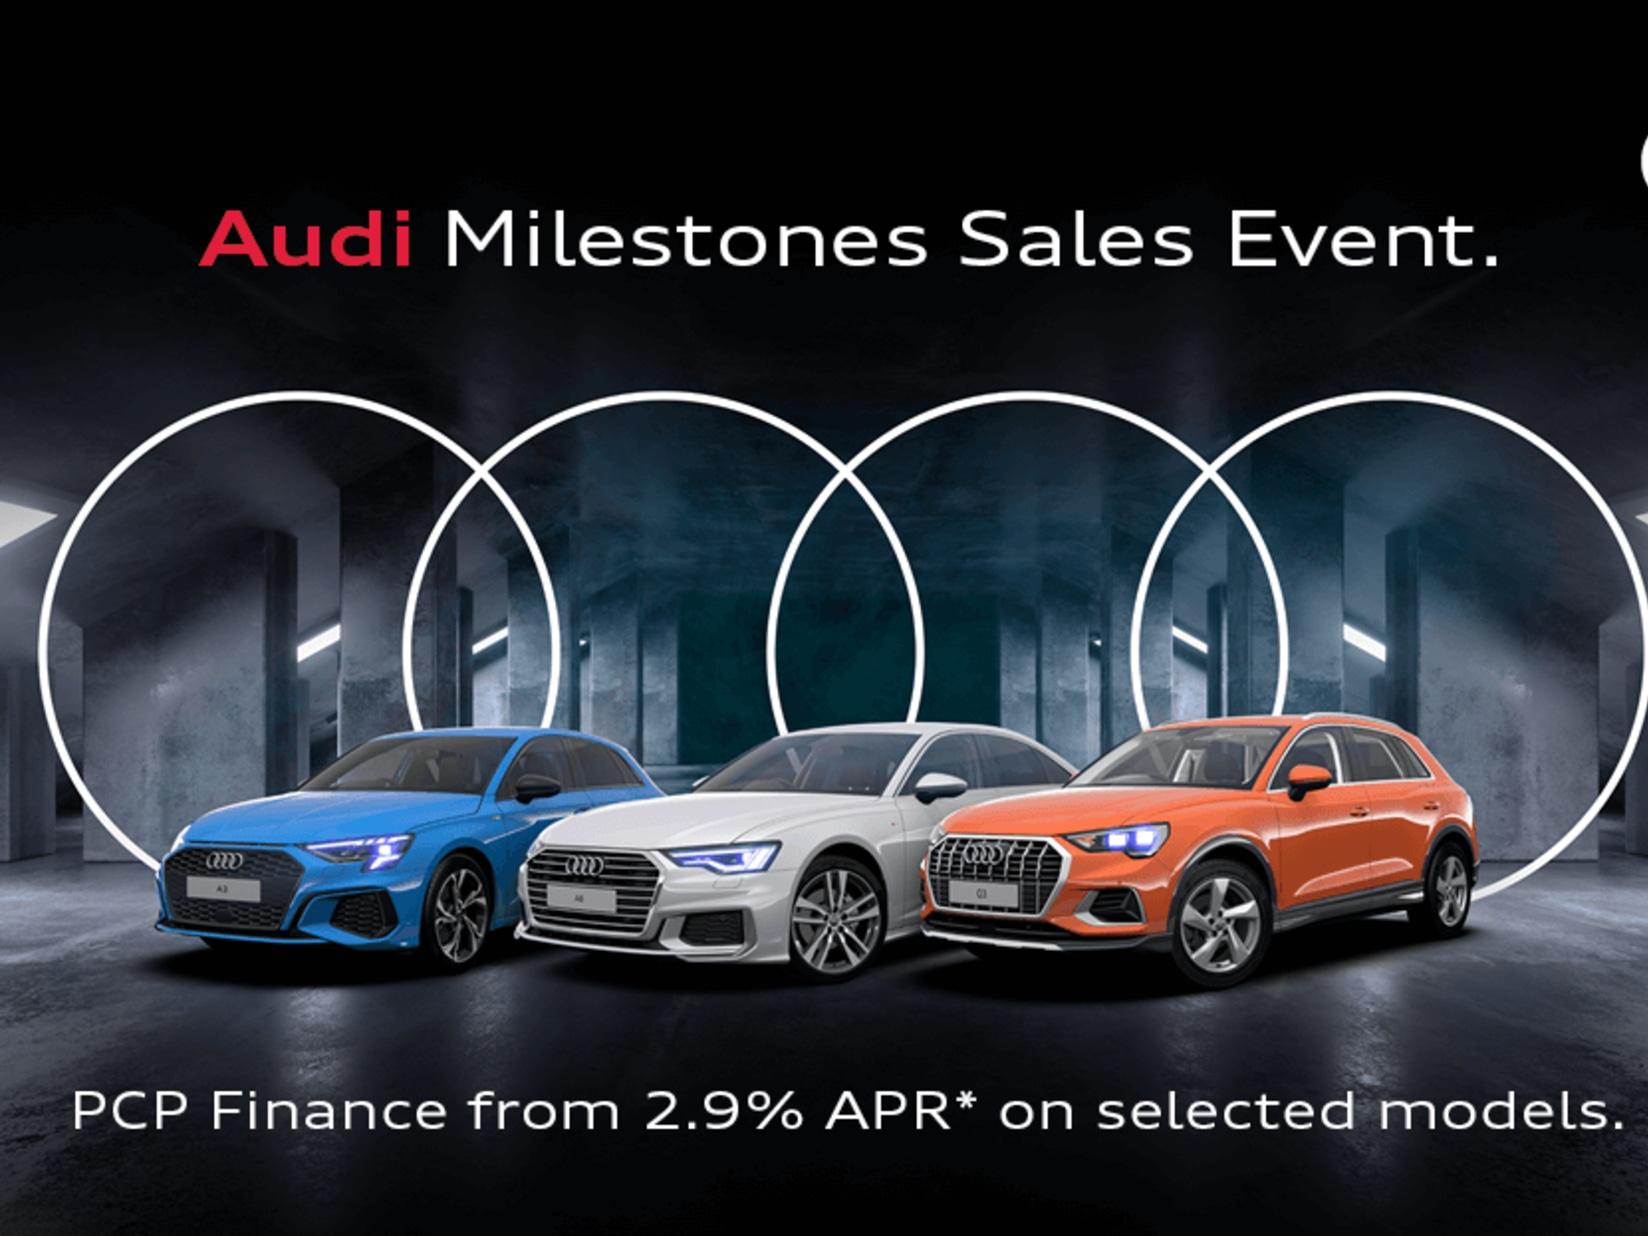 New Audi Car Dealer Dublin Ireland New Audi Prices Offers Joeduffy Ie